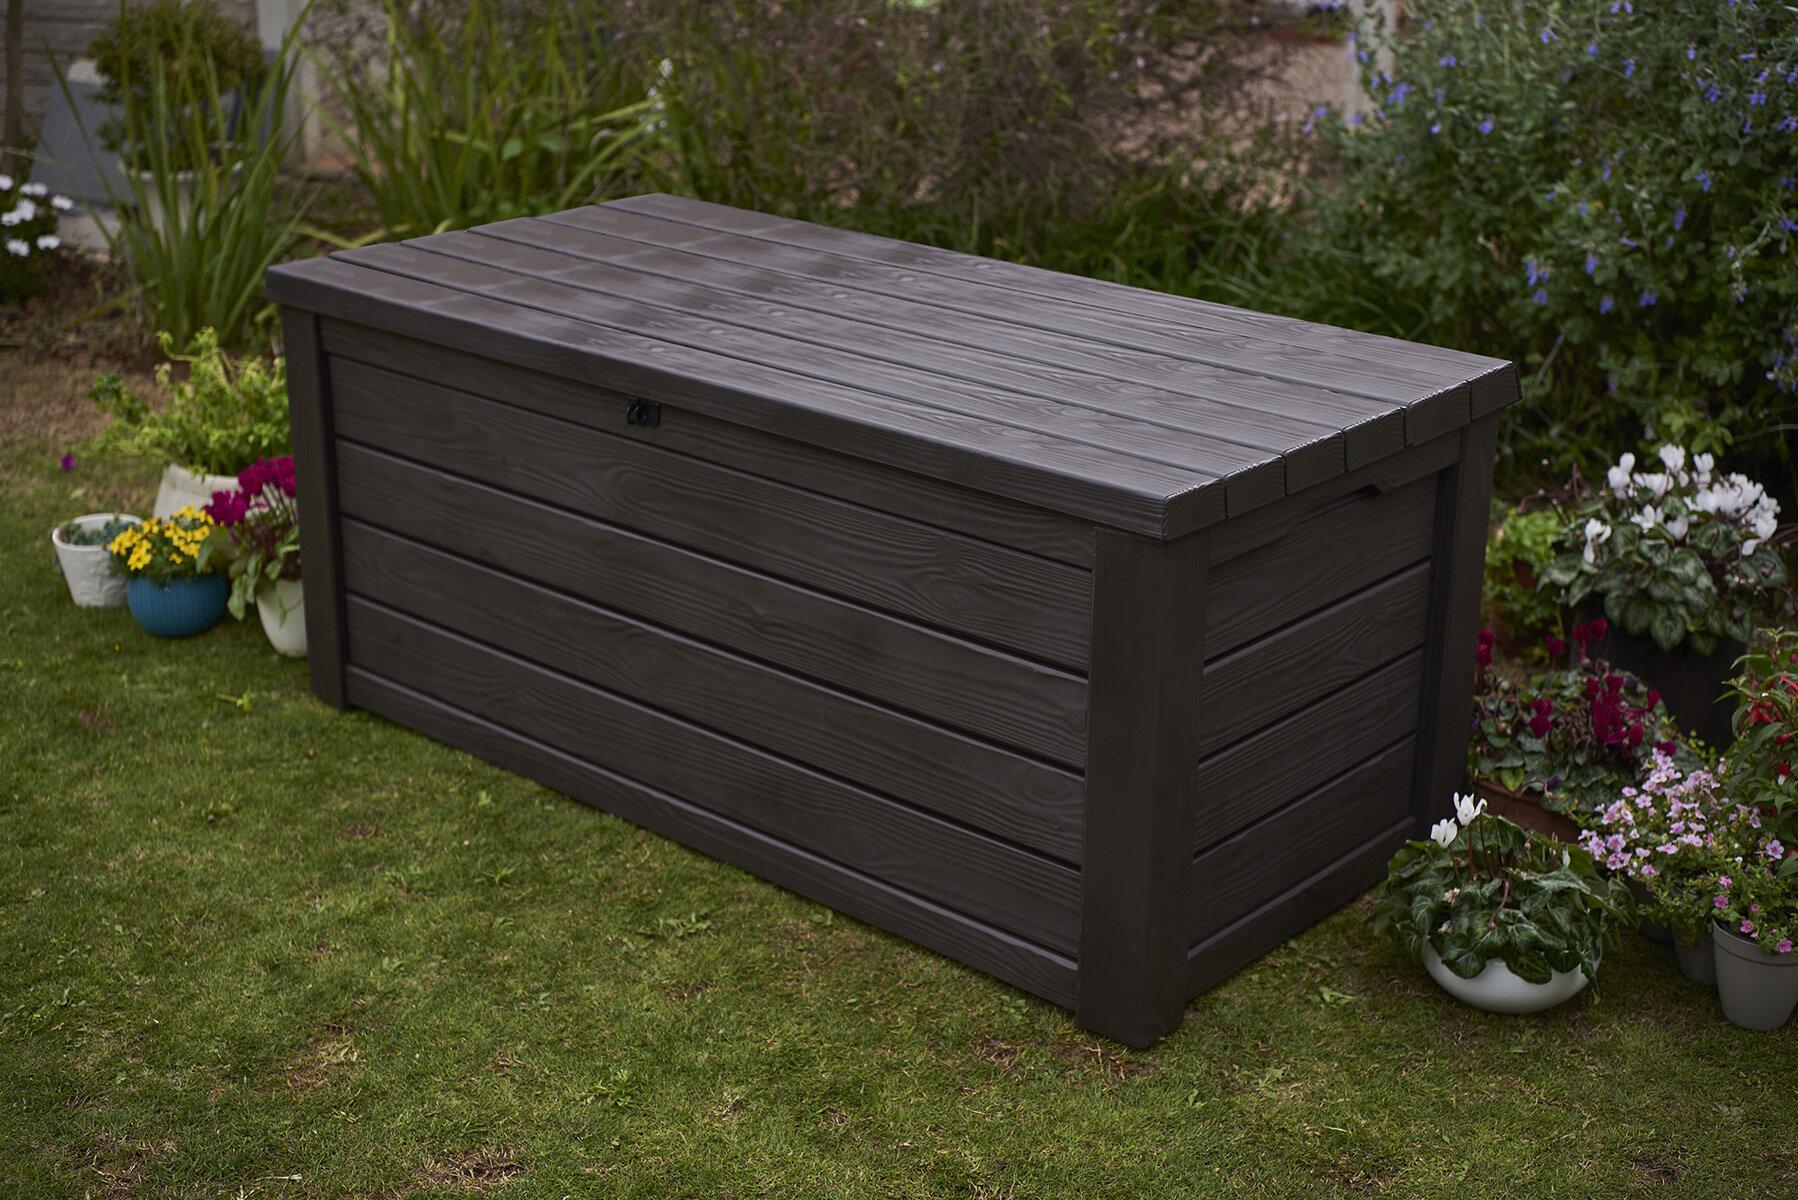 377b253e7623 Eastwood 150 Gallon Resin Deck Box